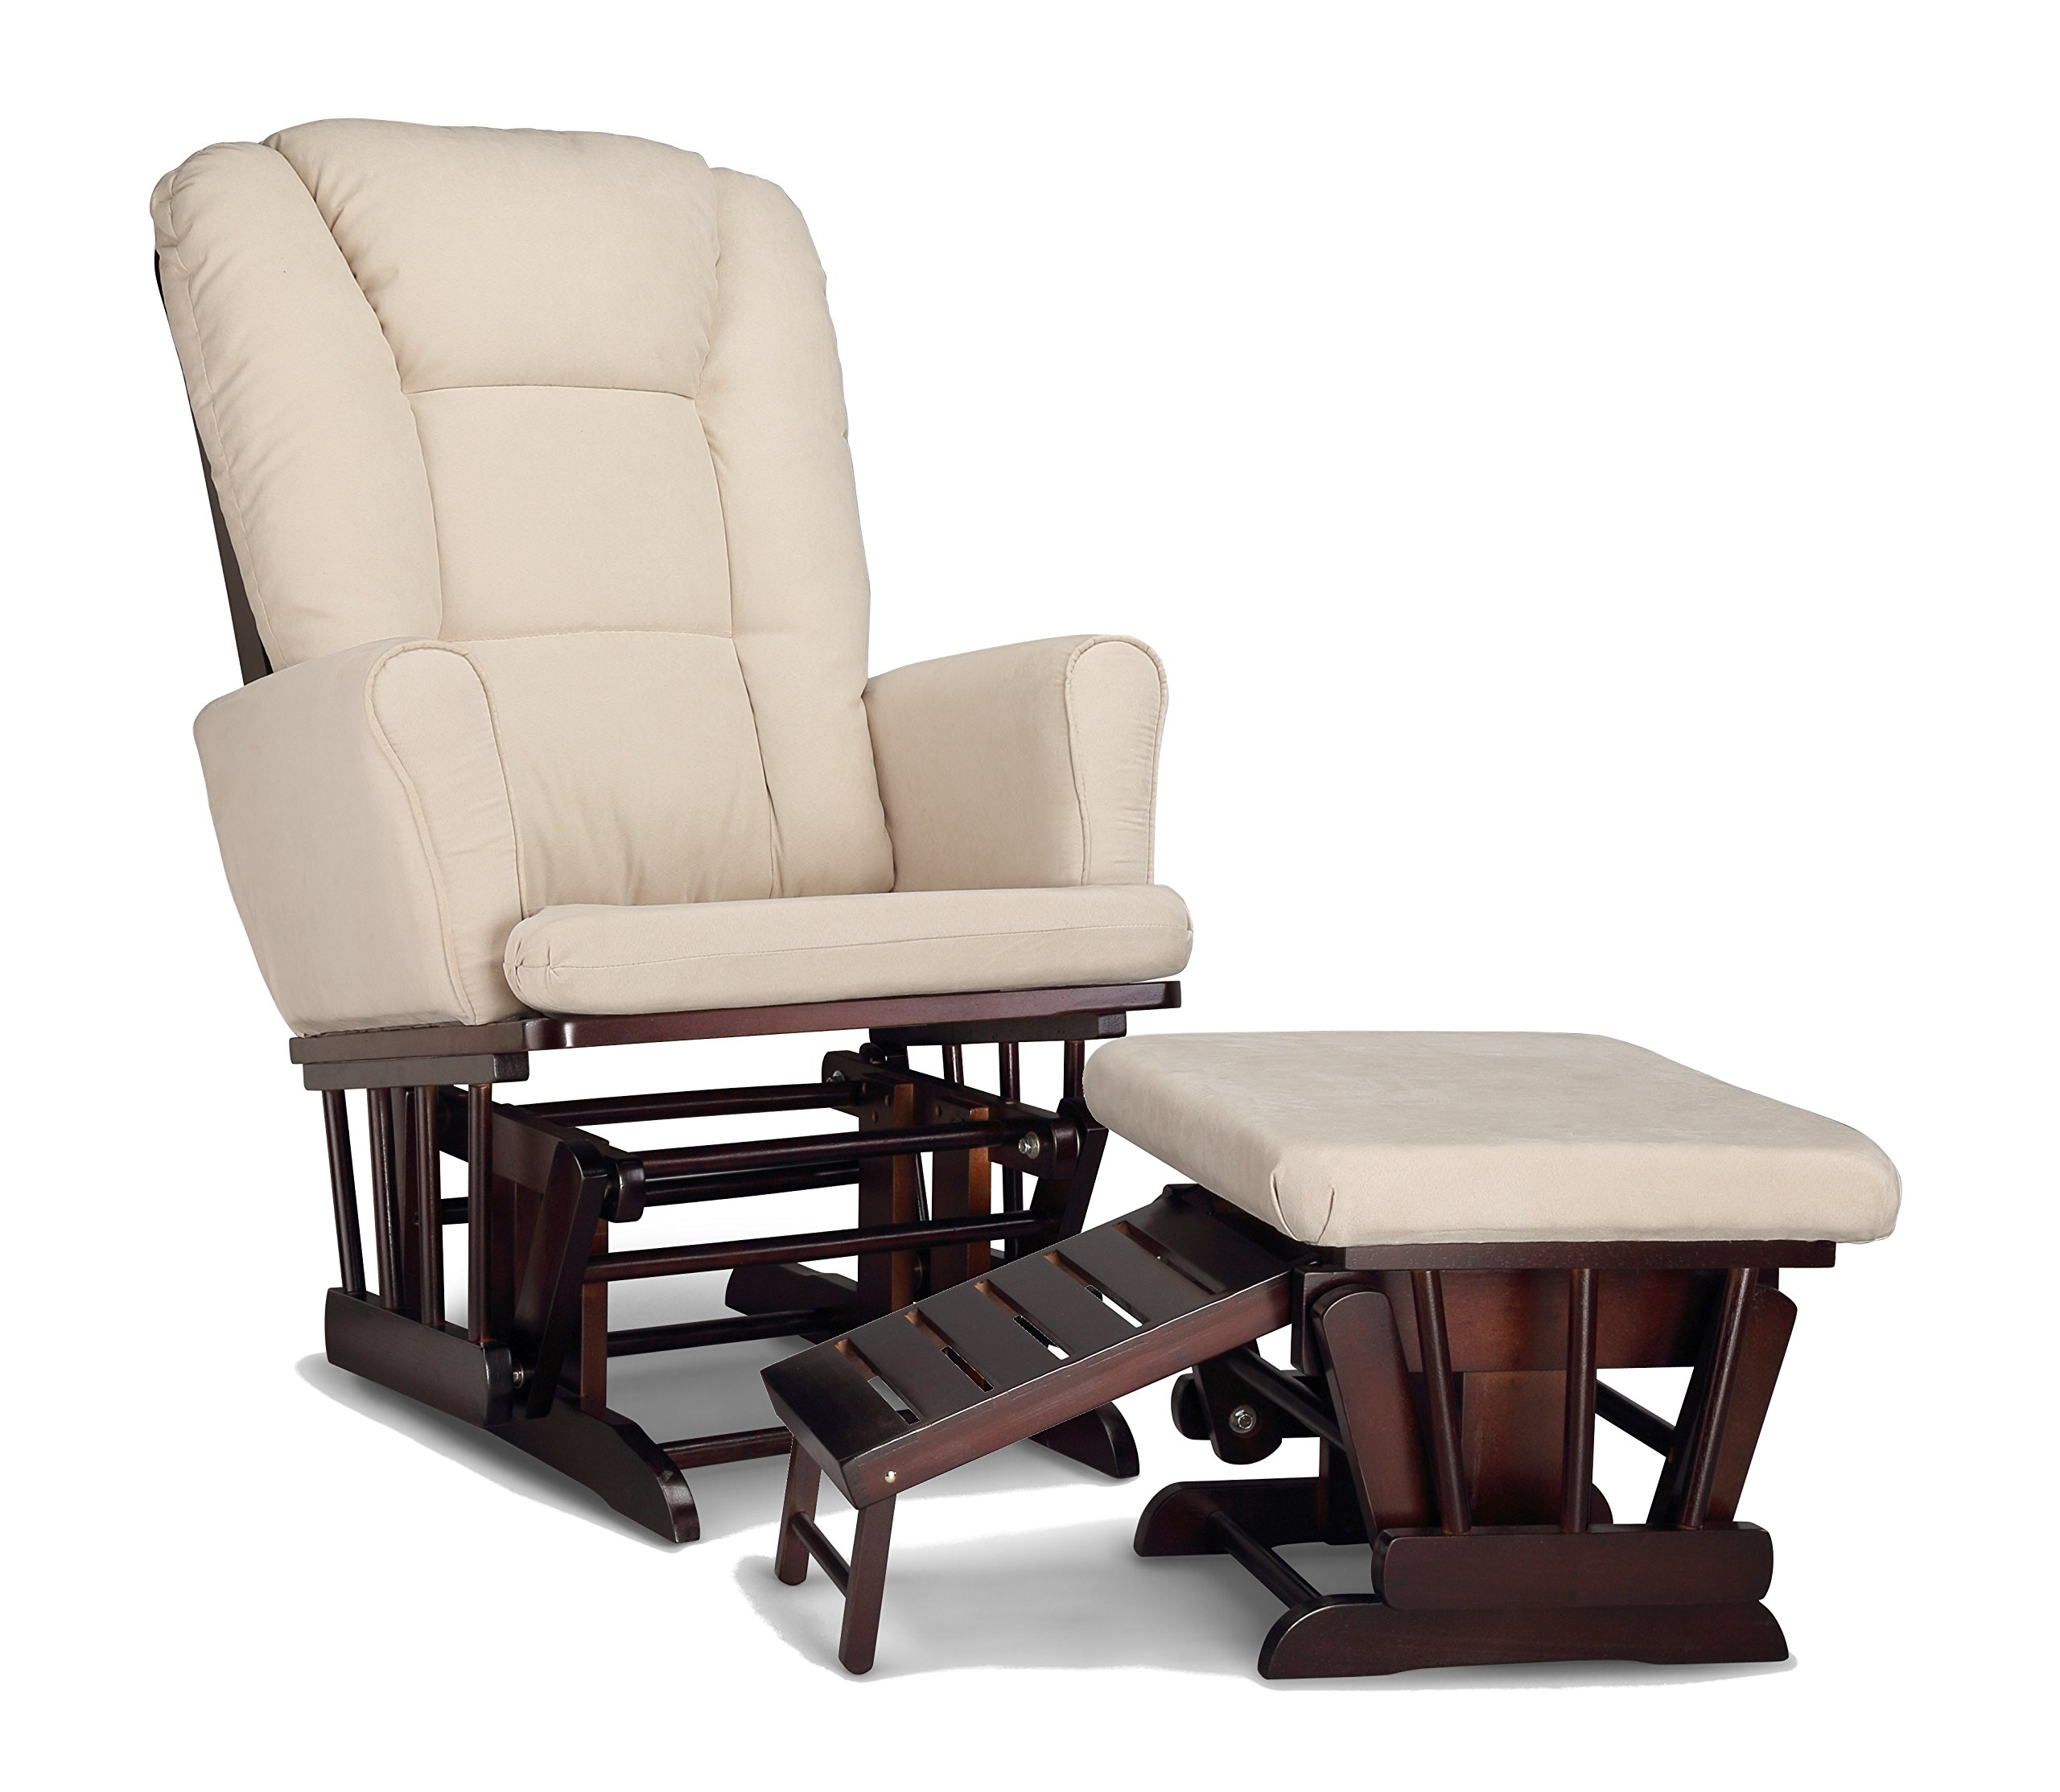 Graco Sterling Semi-Upholstered Glider and Nursing Ottoman, Espresso/Beige